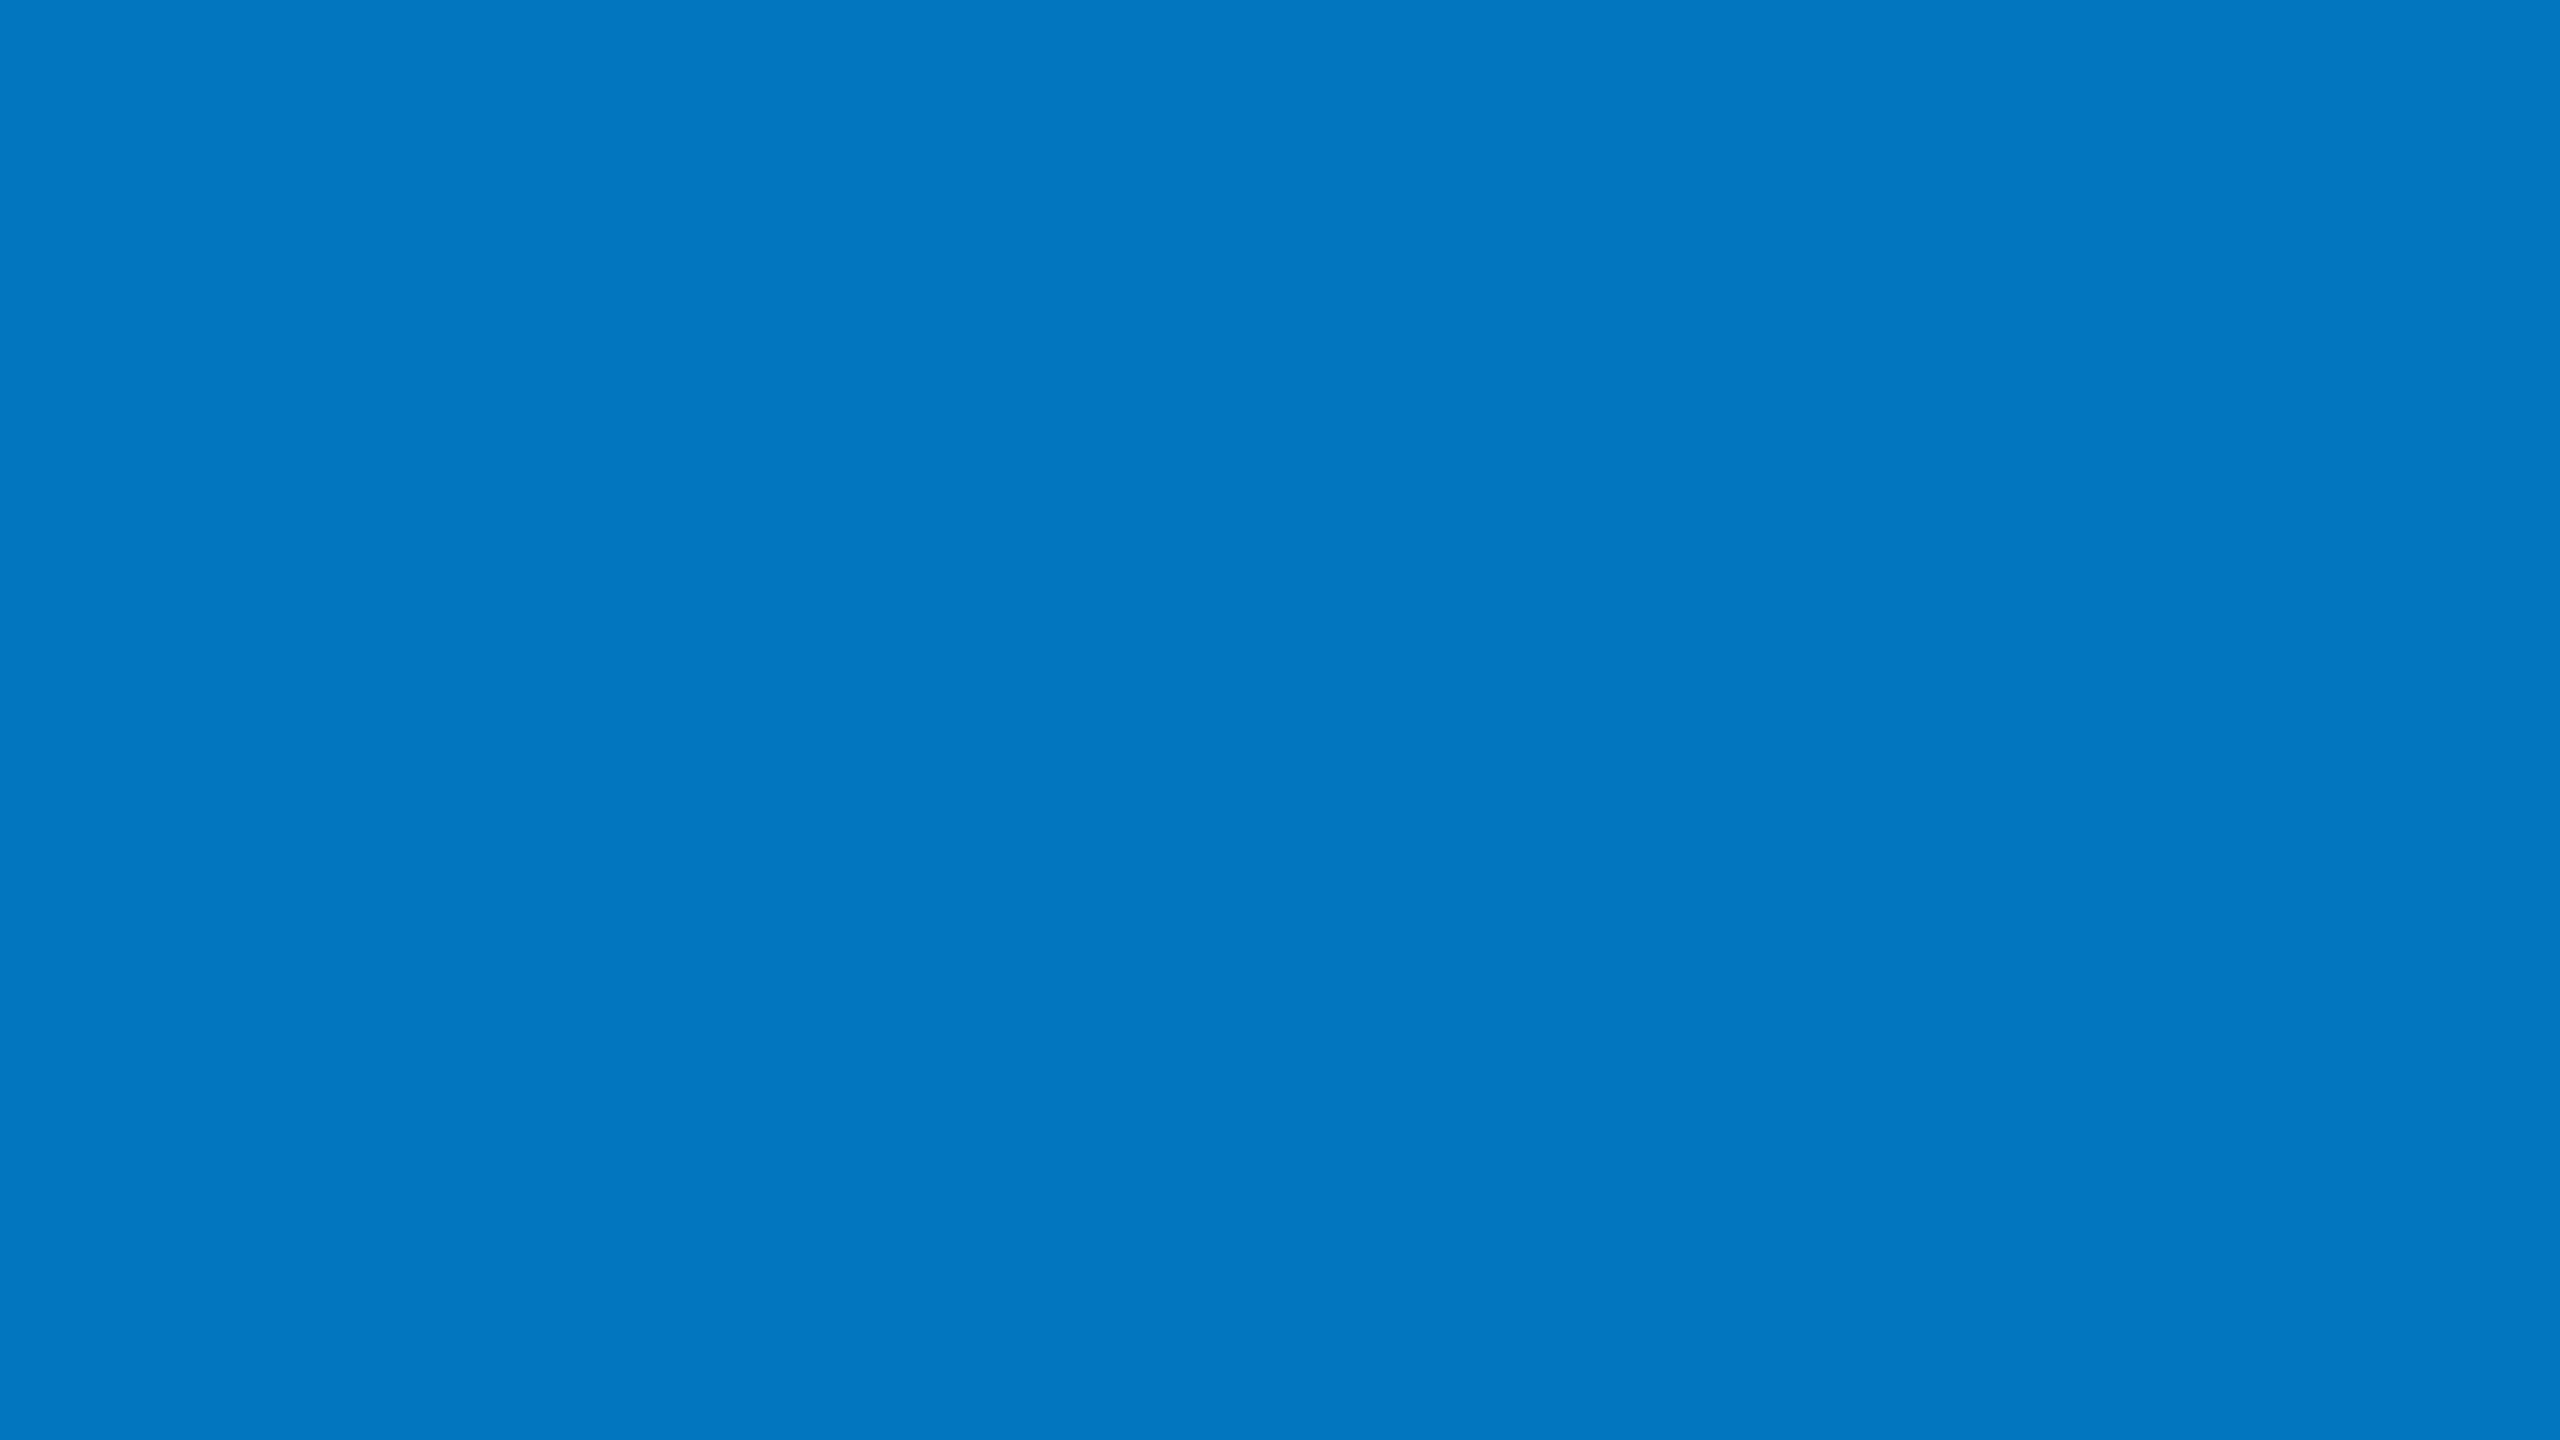 2560x1440 Ocean Boat Blue Solid Color Background